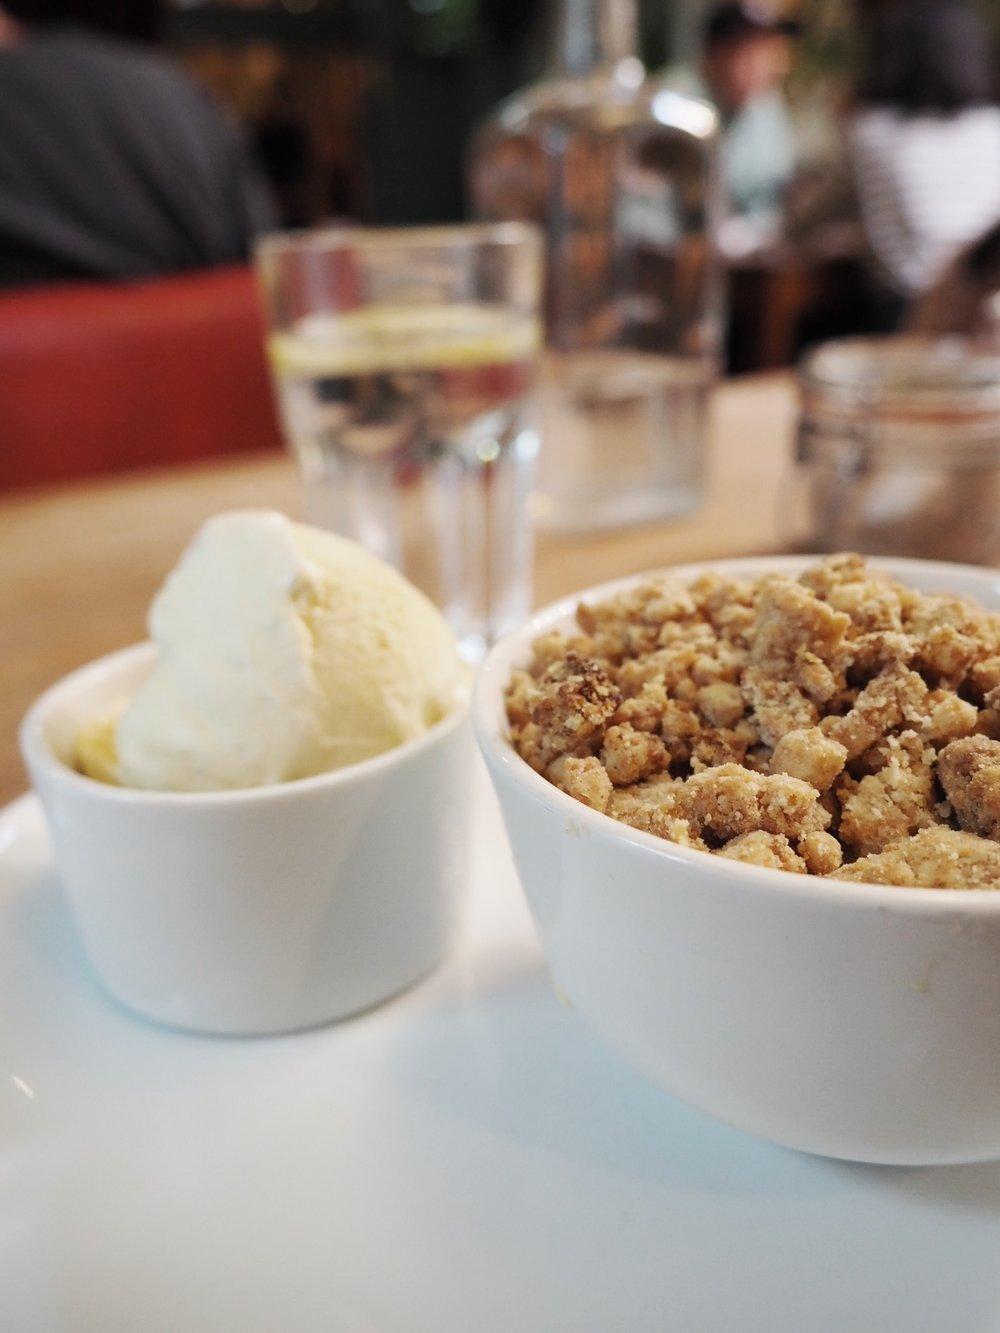 Apple crumble and cream